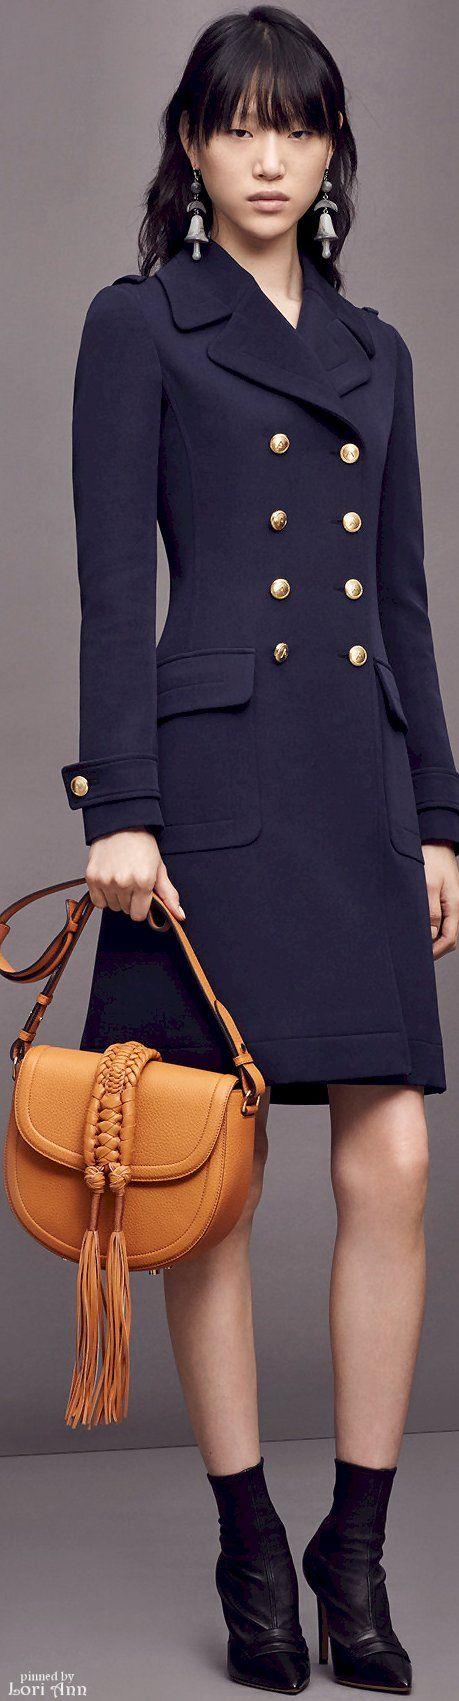 Altuzarra Pre-Fall 2016 women fashion outfit clothing style apparel @roressclothes closet ideas